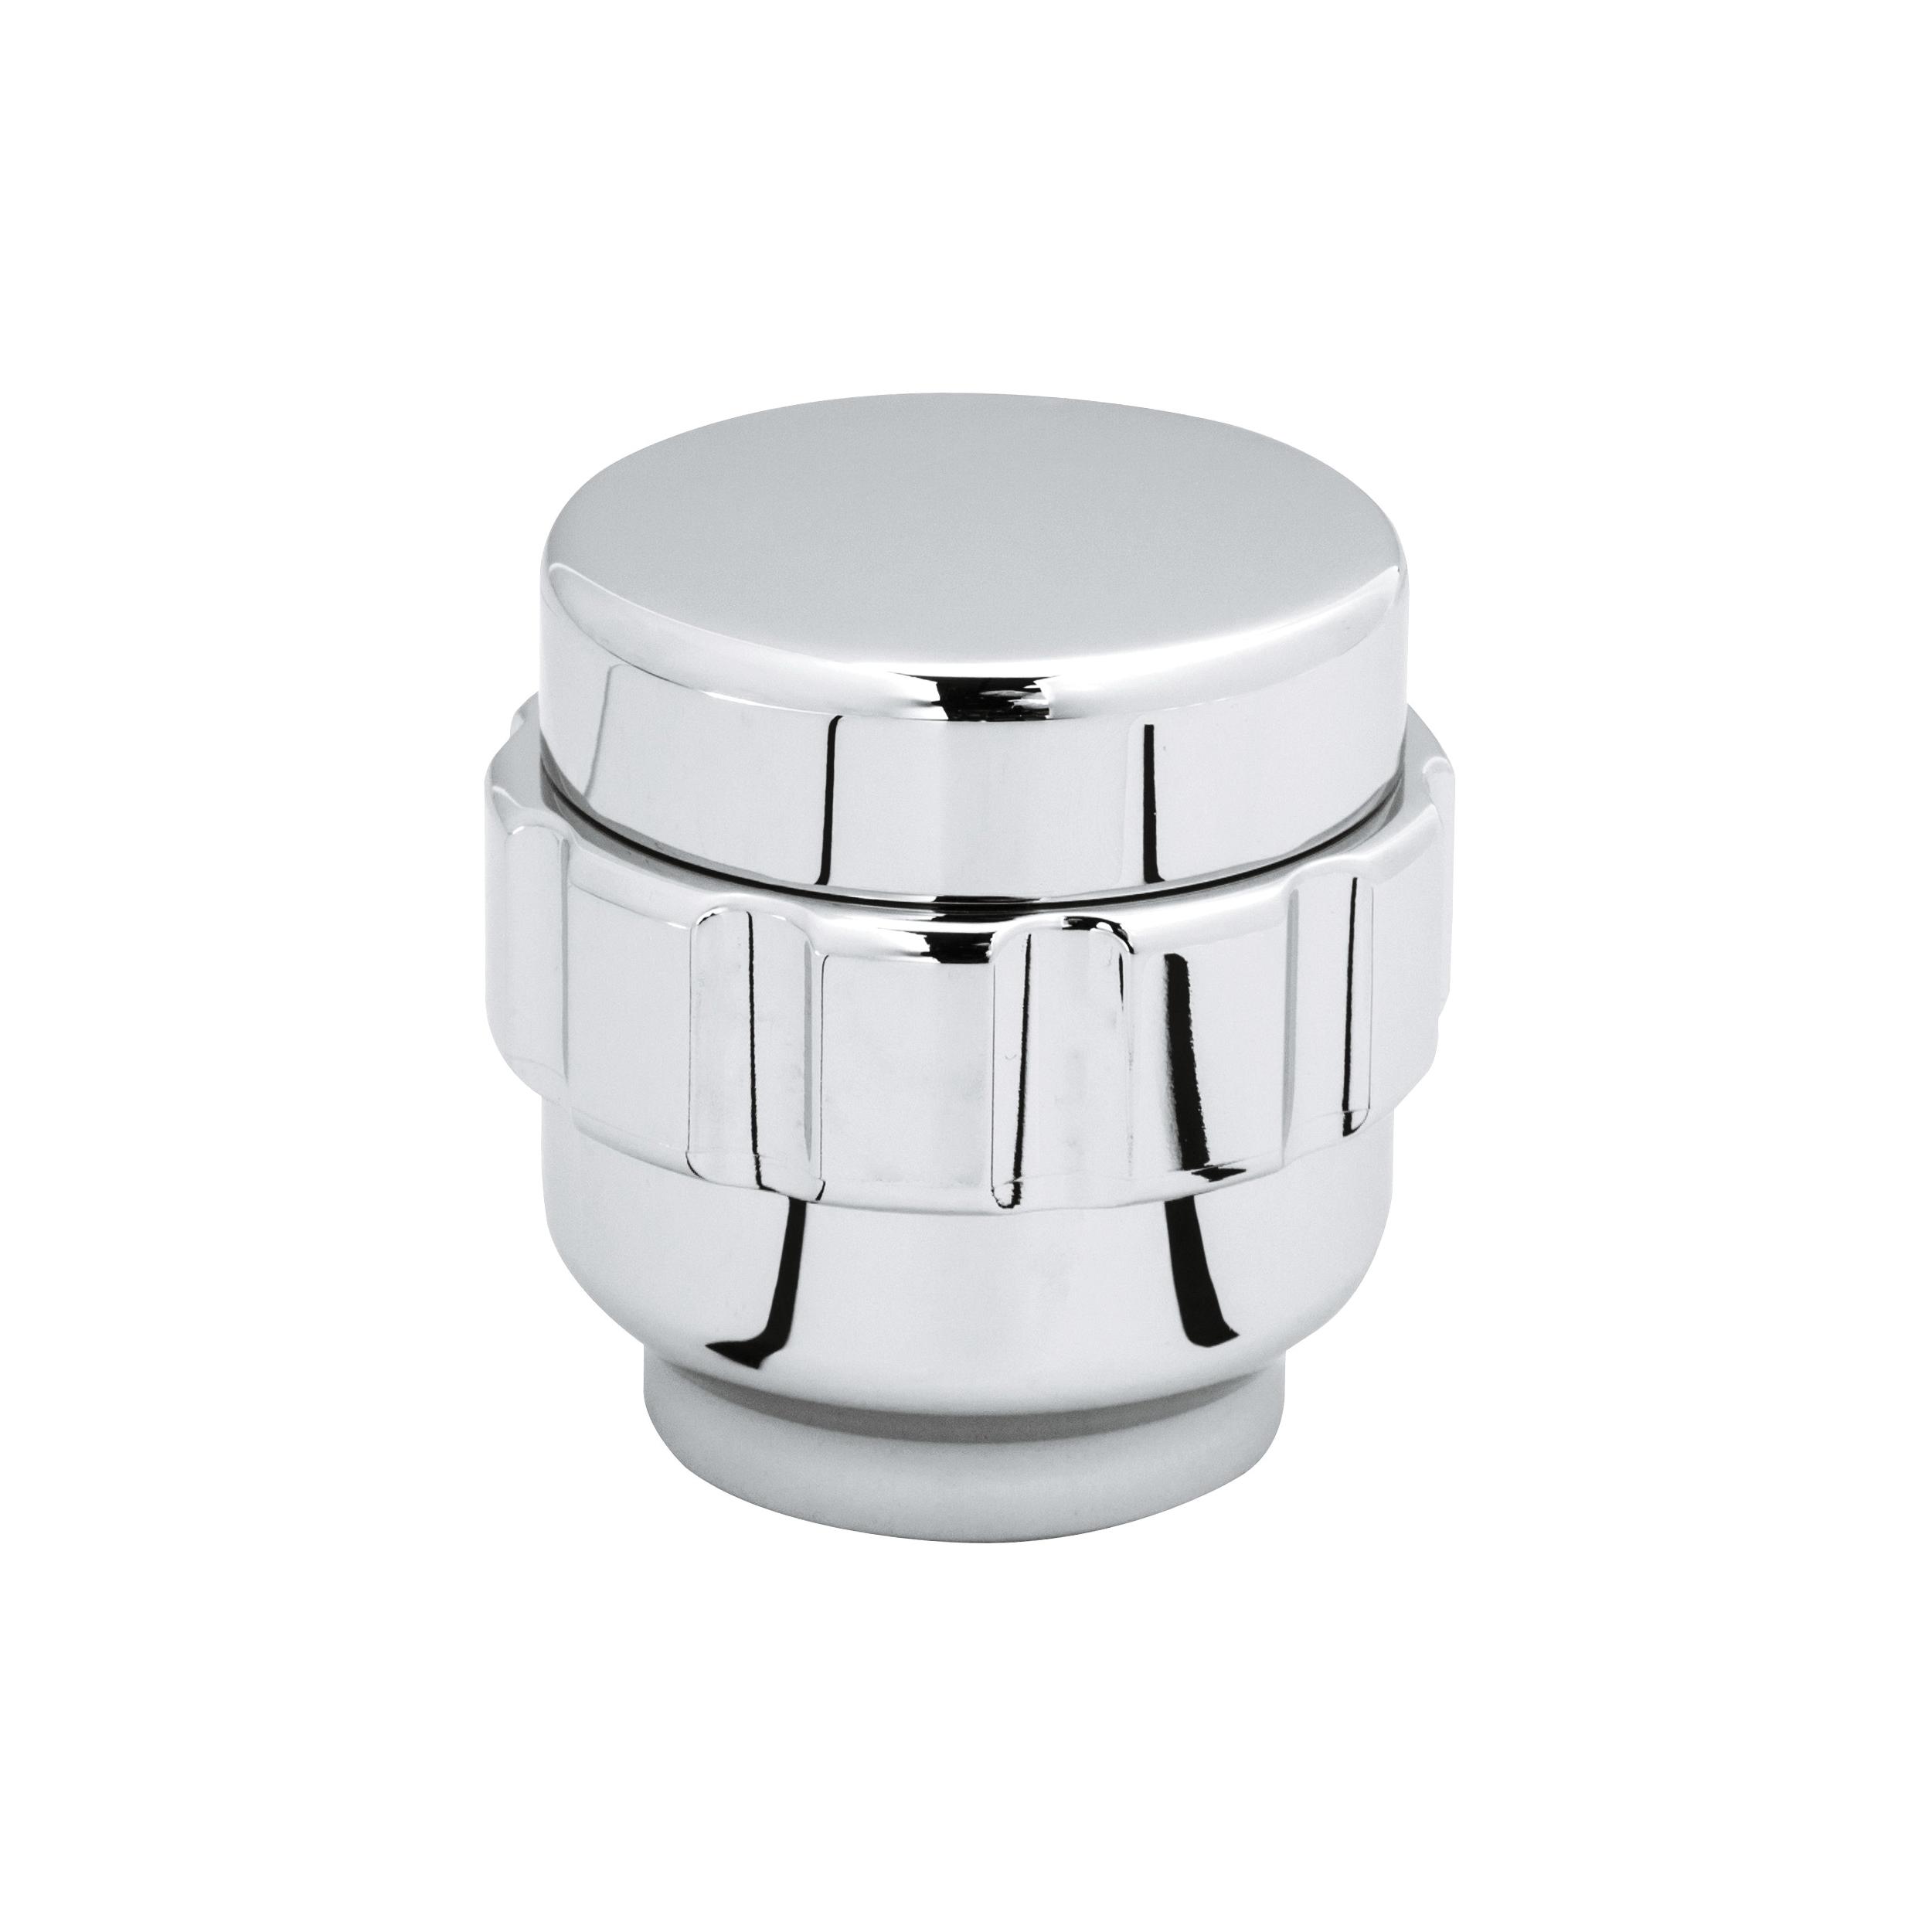 GROHE 45477000 Ultra Grip Ring Knob Handle, Brass, StarLight® Chrome, Import